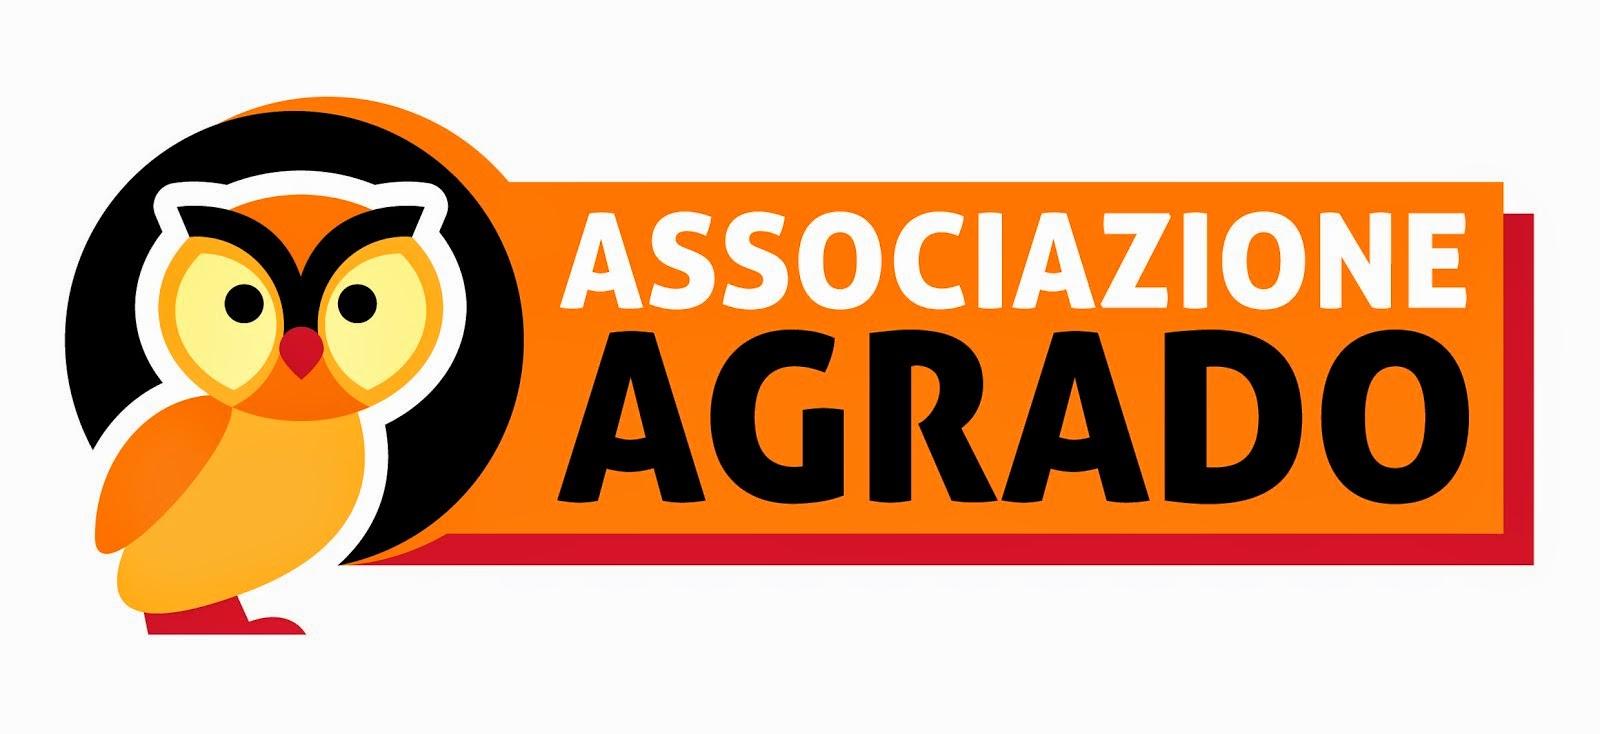 Associazione Agrado